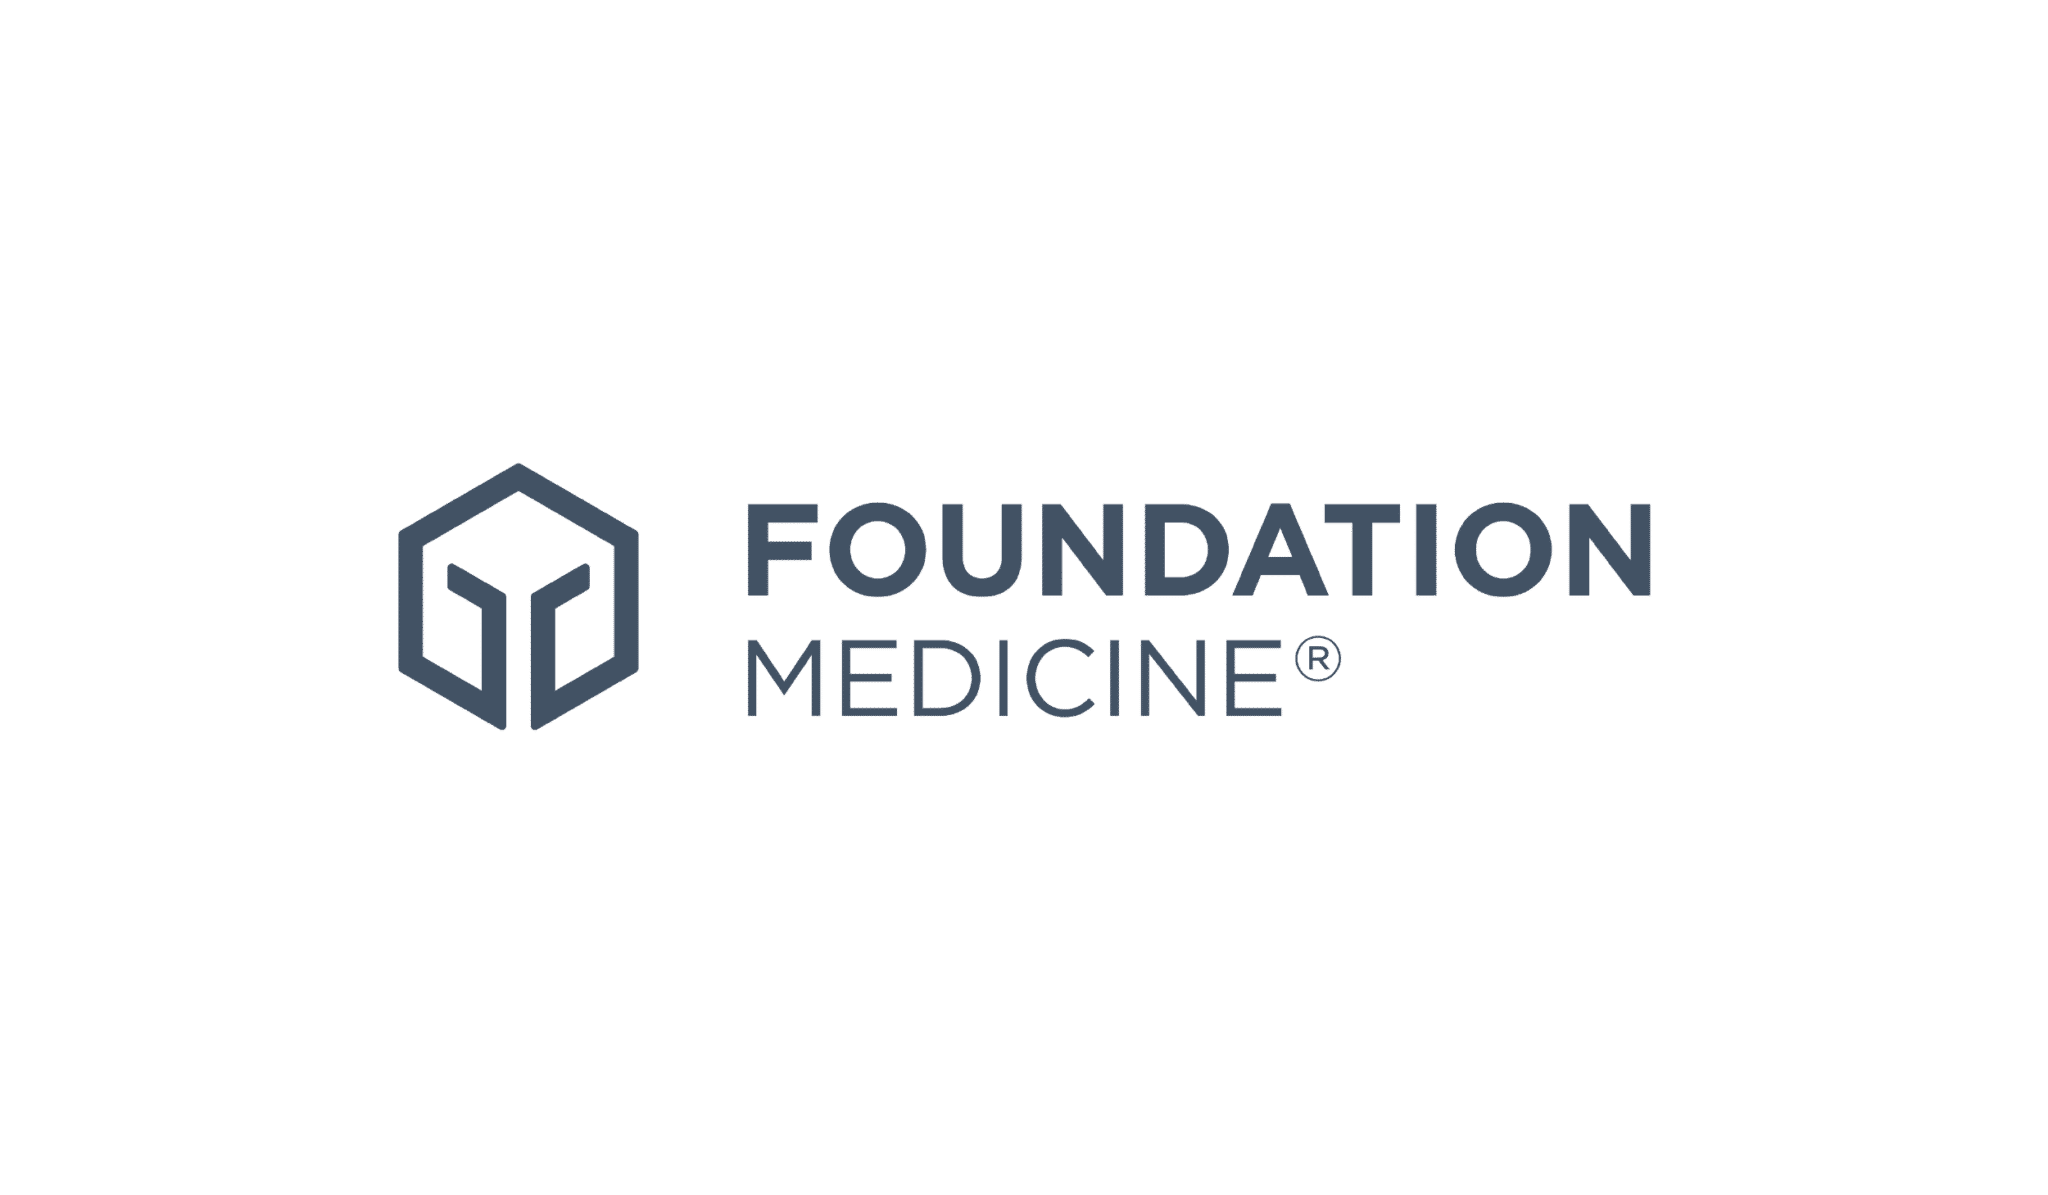 foundationmedicine support